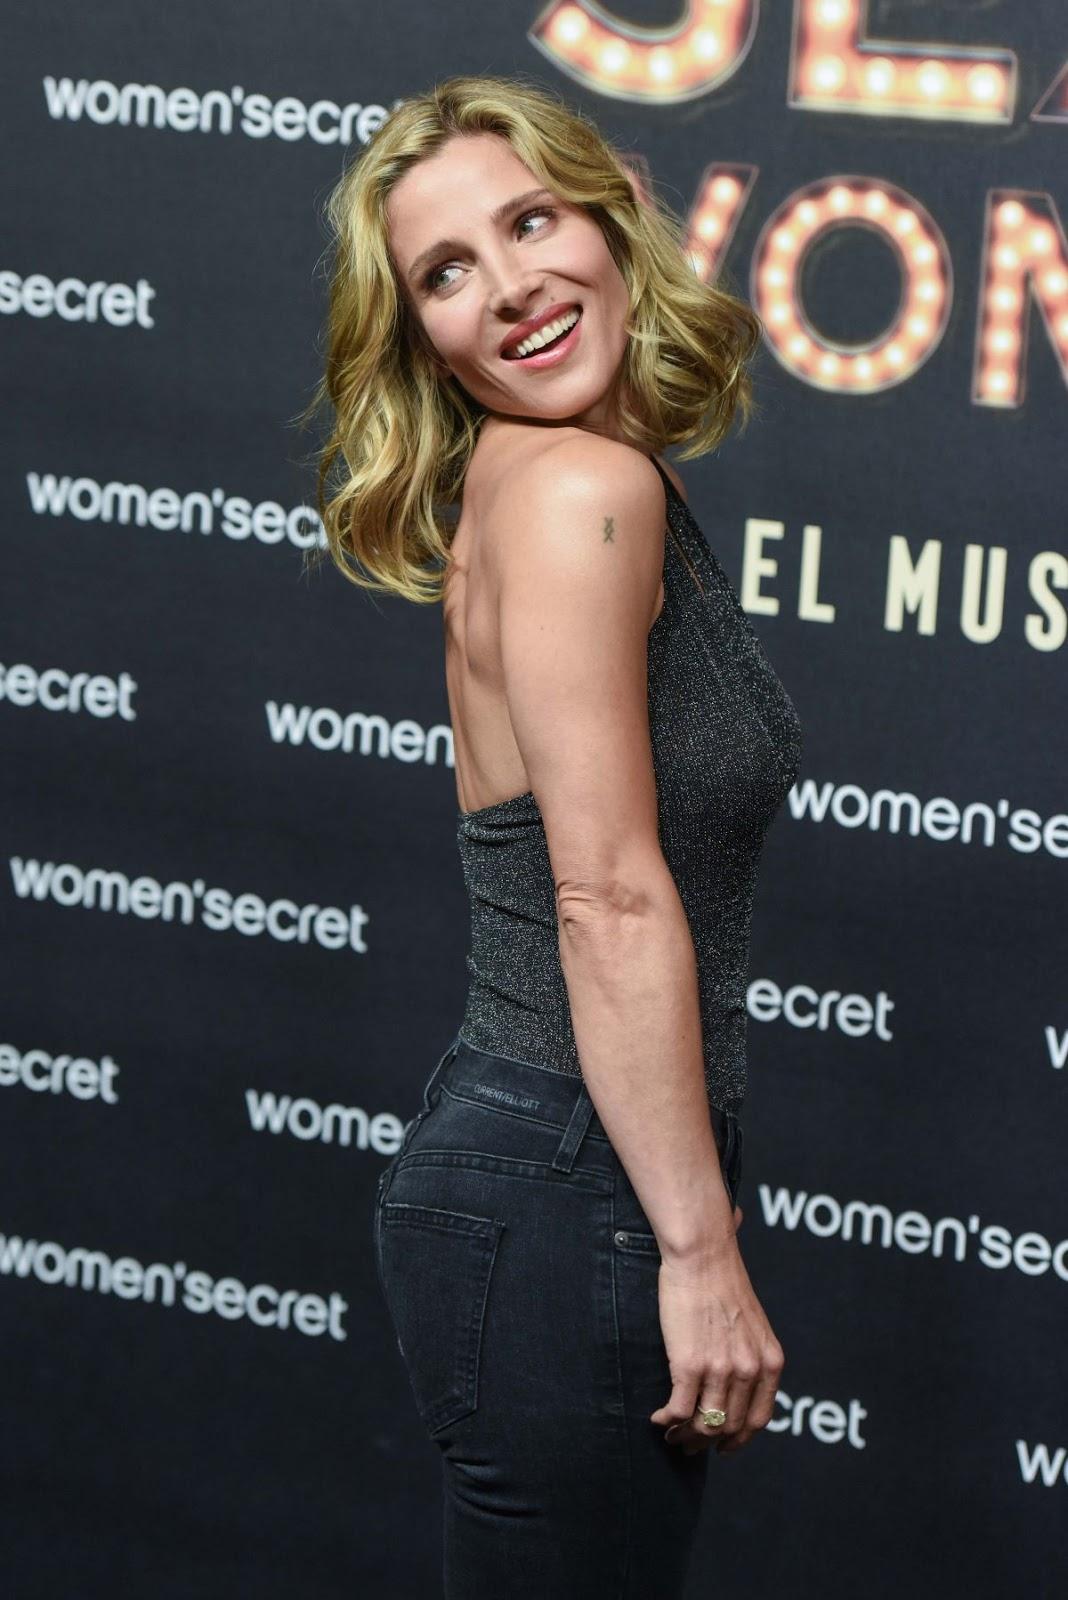 Elsa Pataky Presents New 'Women Secret' Musical